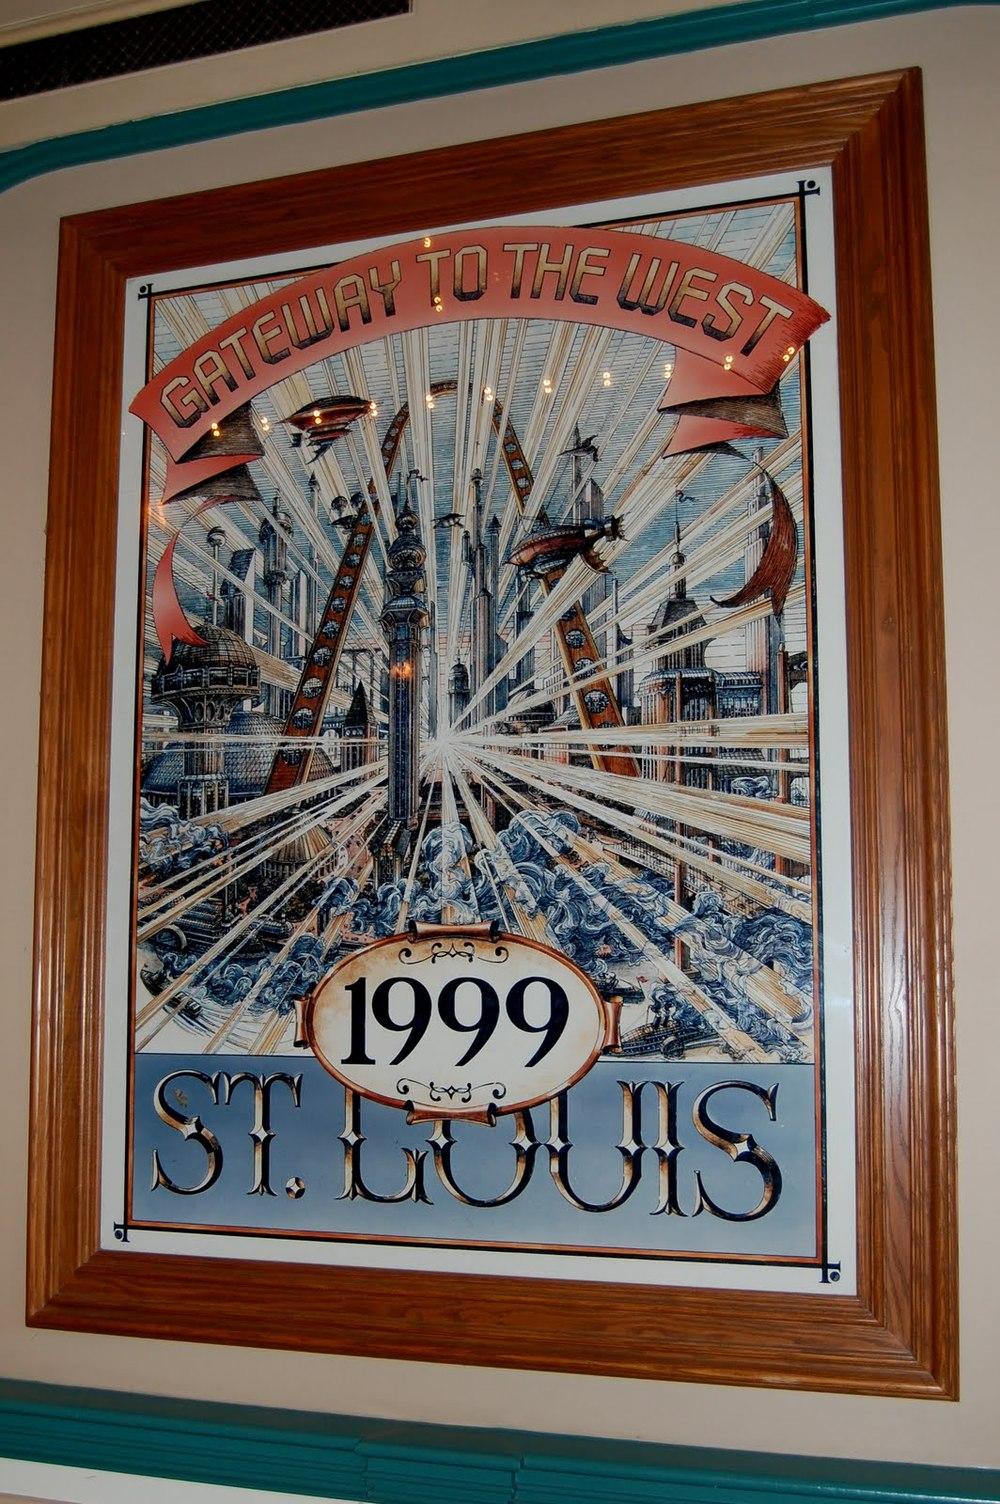 Steampunk Retro Futuristic Disneyland Posters